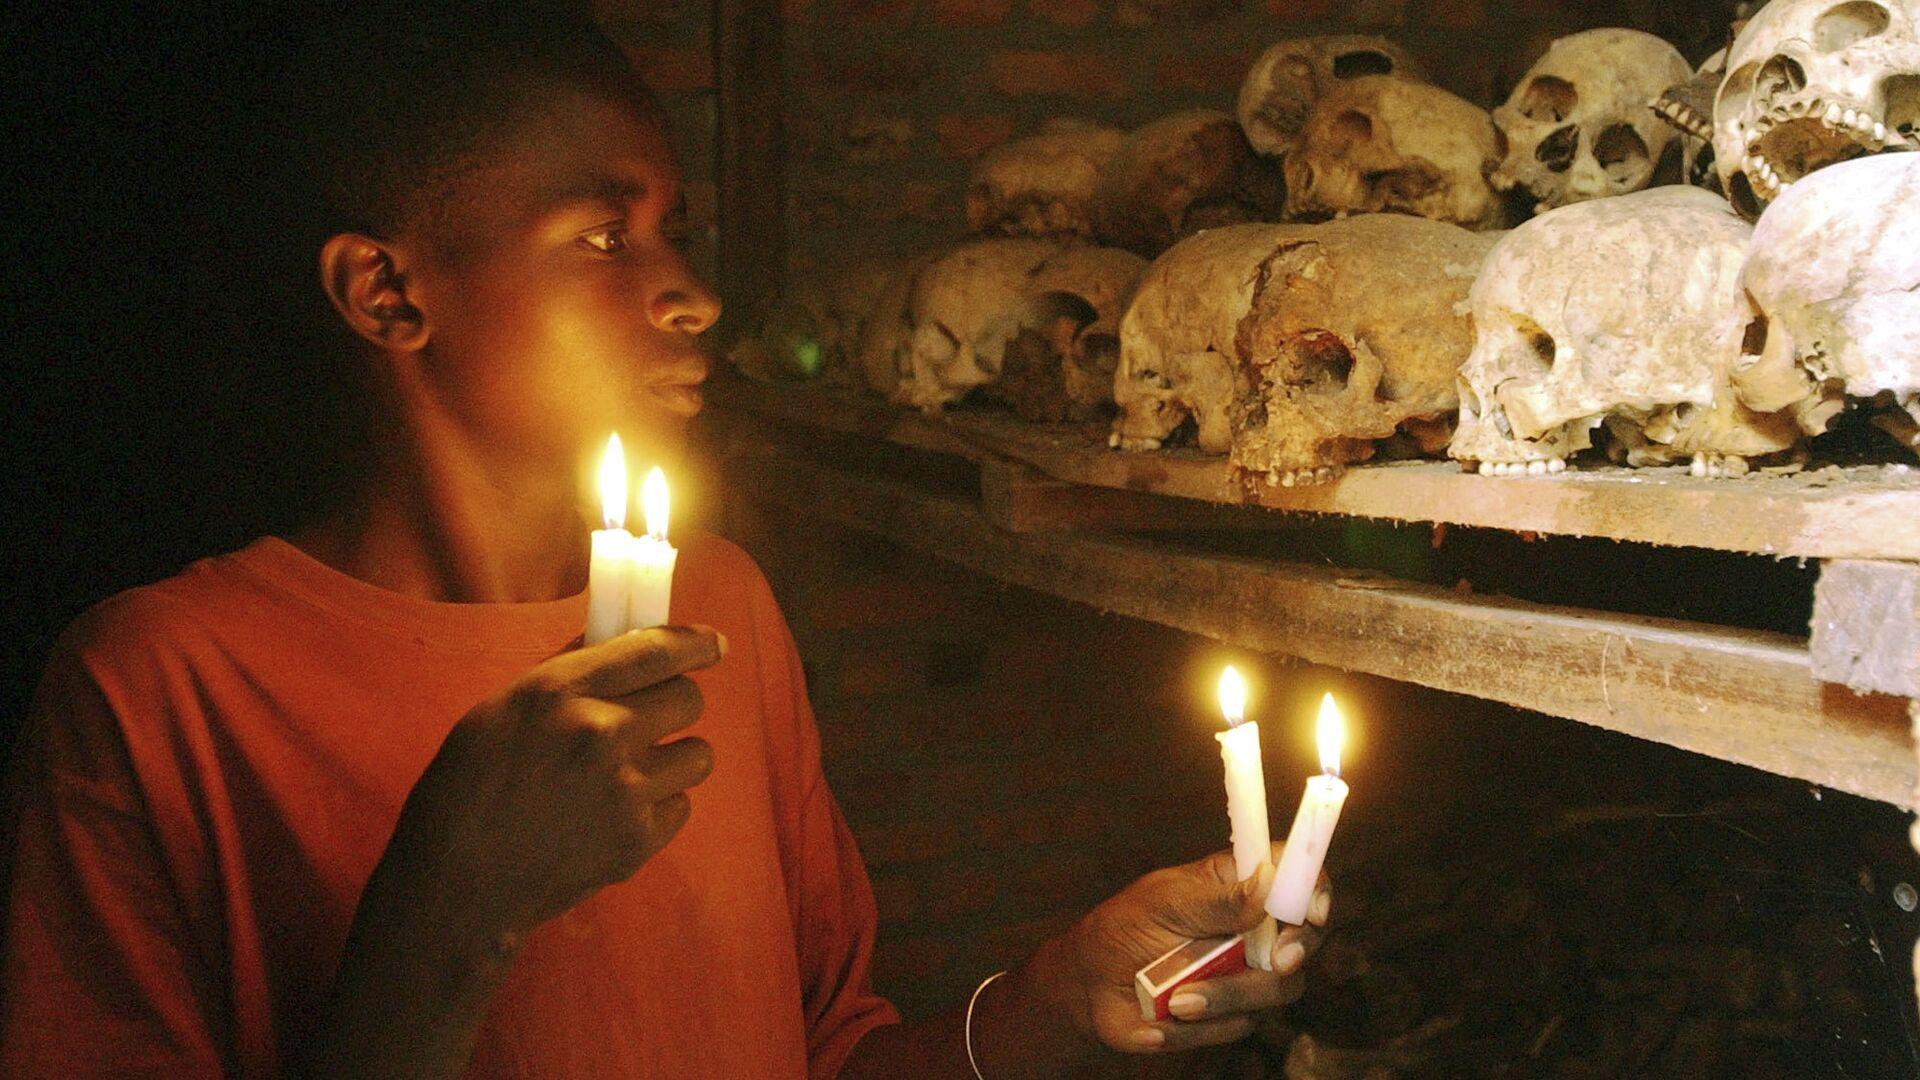 Génocide rwandais - Sputnik France, 1920, 26.09.2021